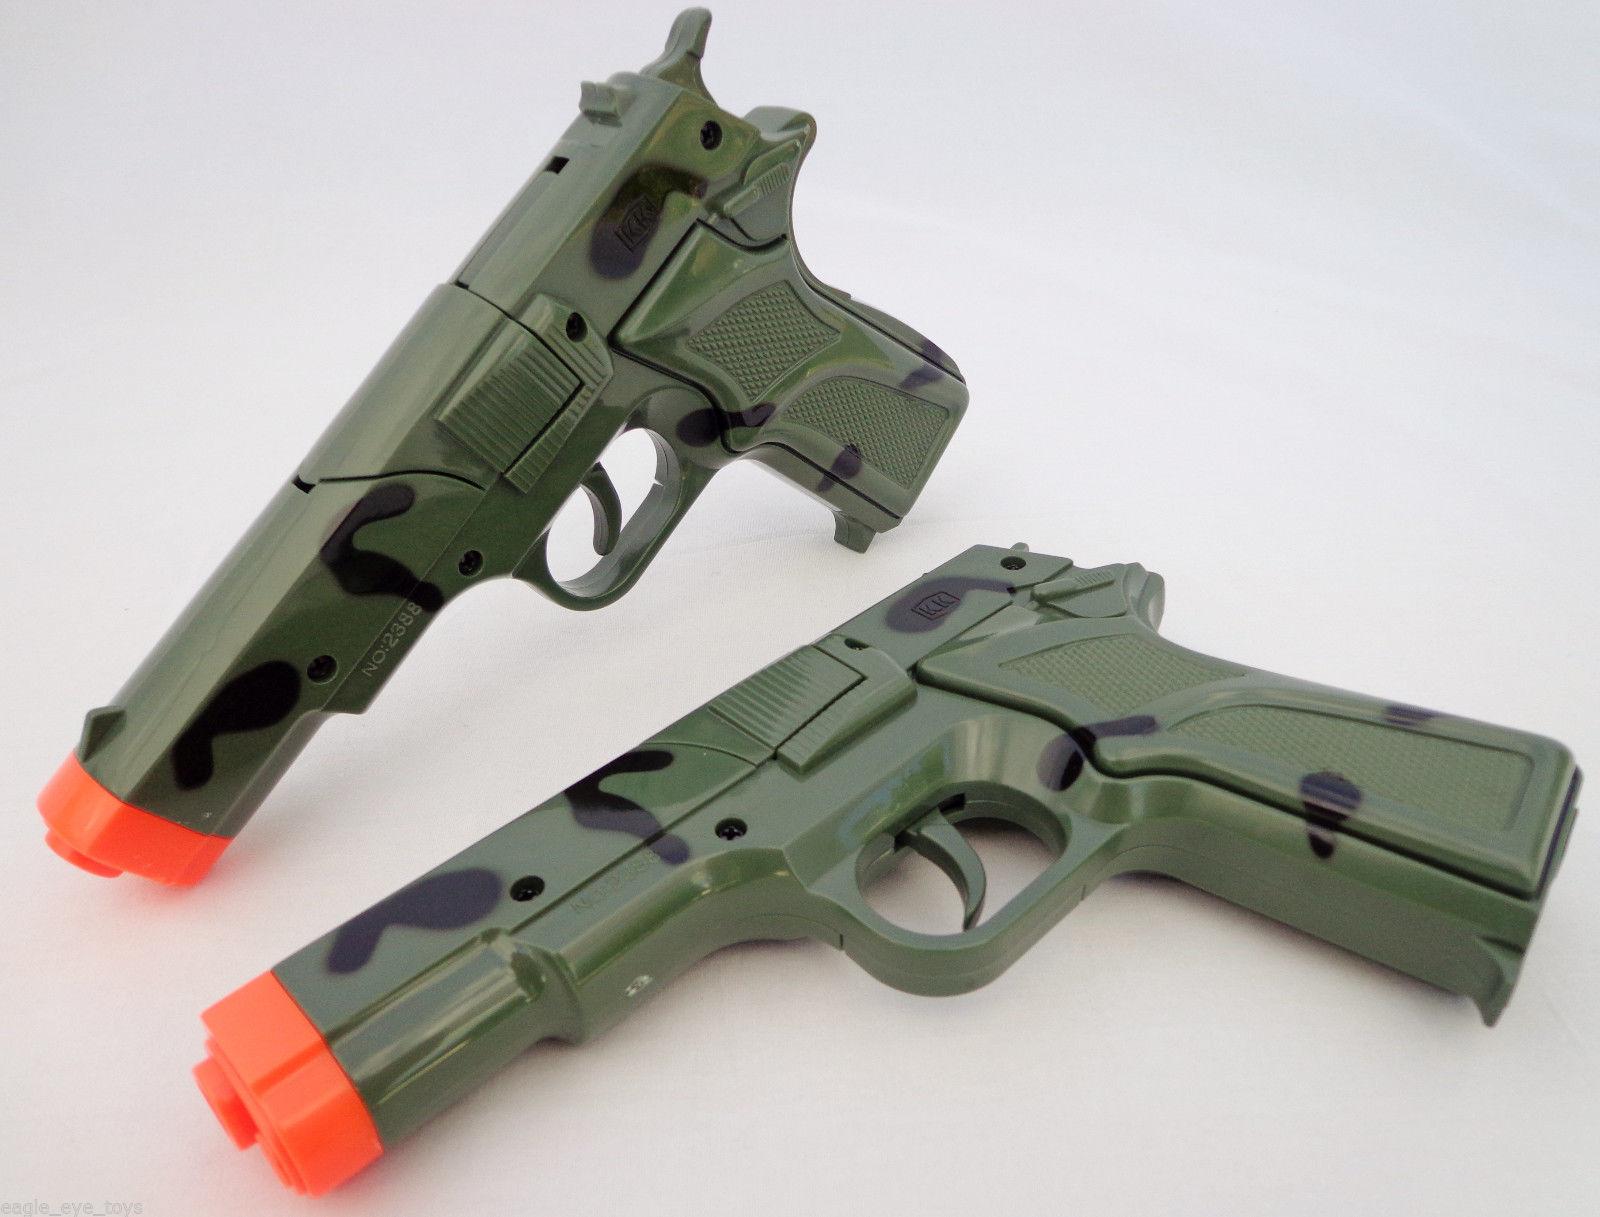 2x Toy Guns Military HUGE Elec MP5  w// Silencer /& Black Pistol 9MM Toy Gun Set